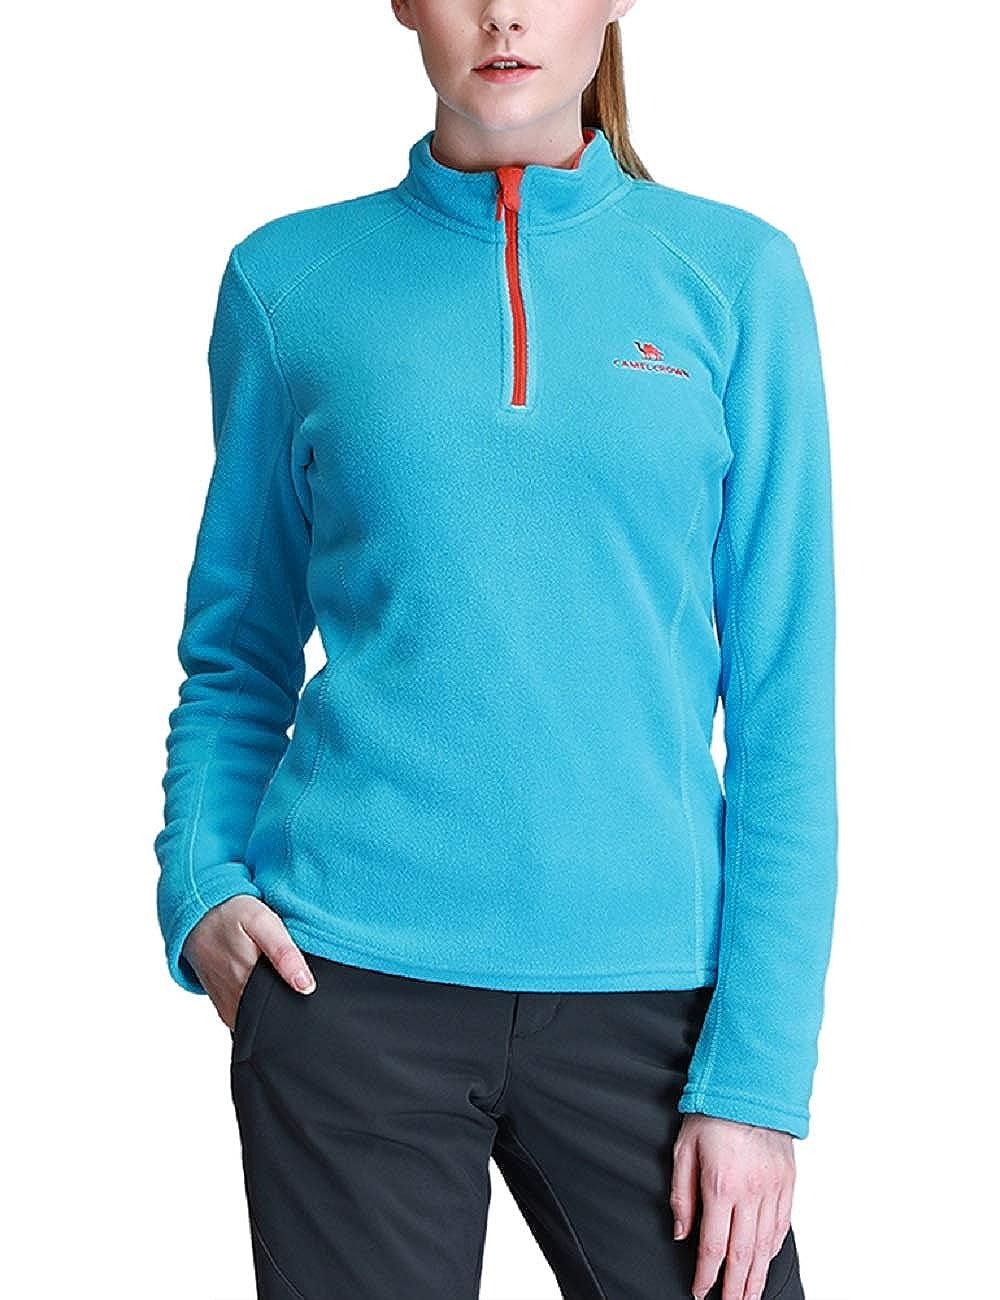 CAMEL CROWN Damen Fleece 1/4 Reißverschluss Fleecejacke Pullover Langärmlig Ski Shirt Sweatshirt für Damen